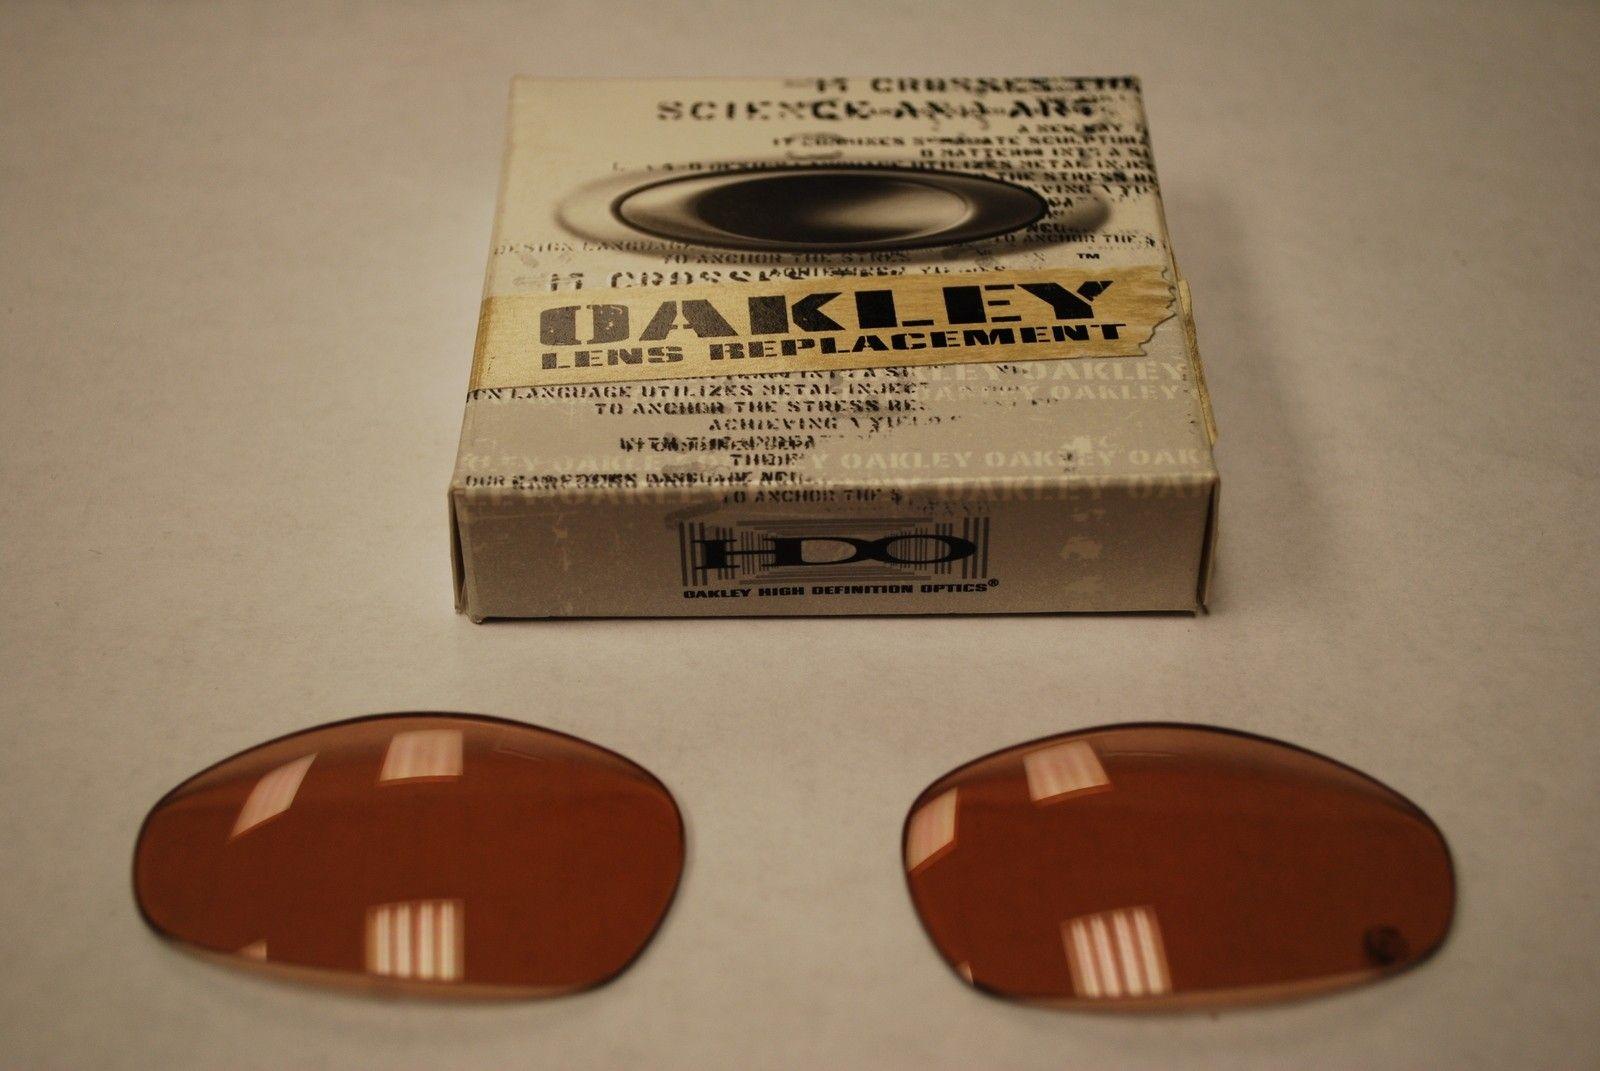 Lenses and rubbers, Ducati, Penny VR28 & more - DSC_0705.JPG